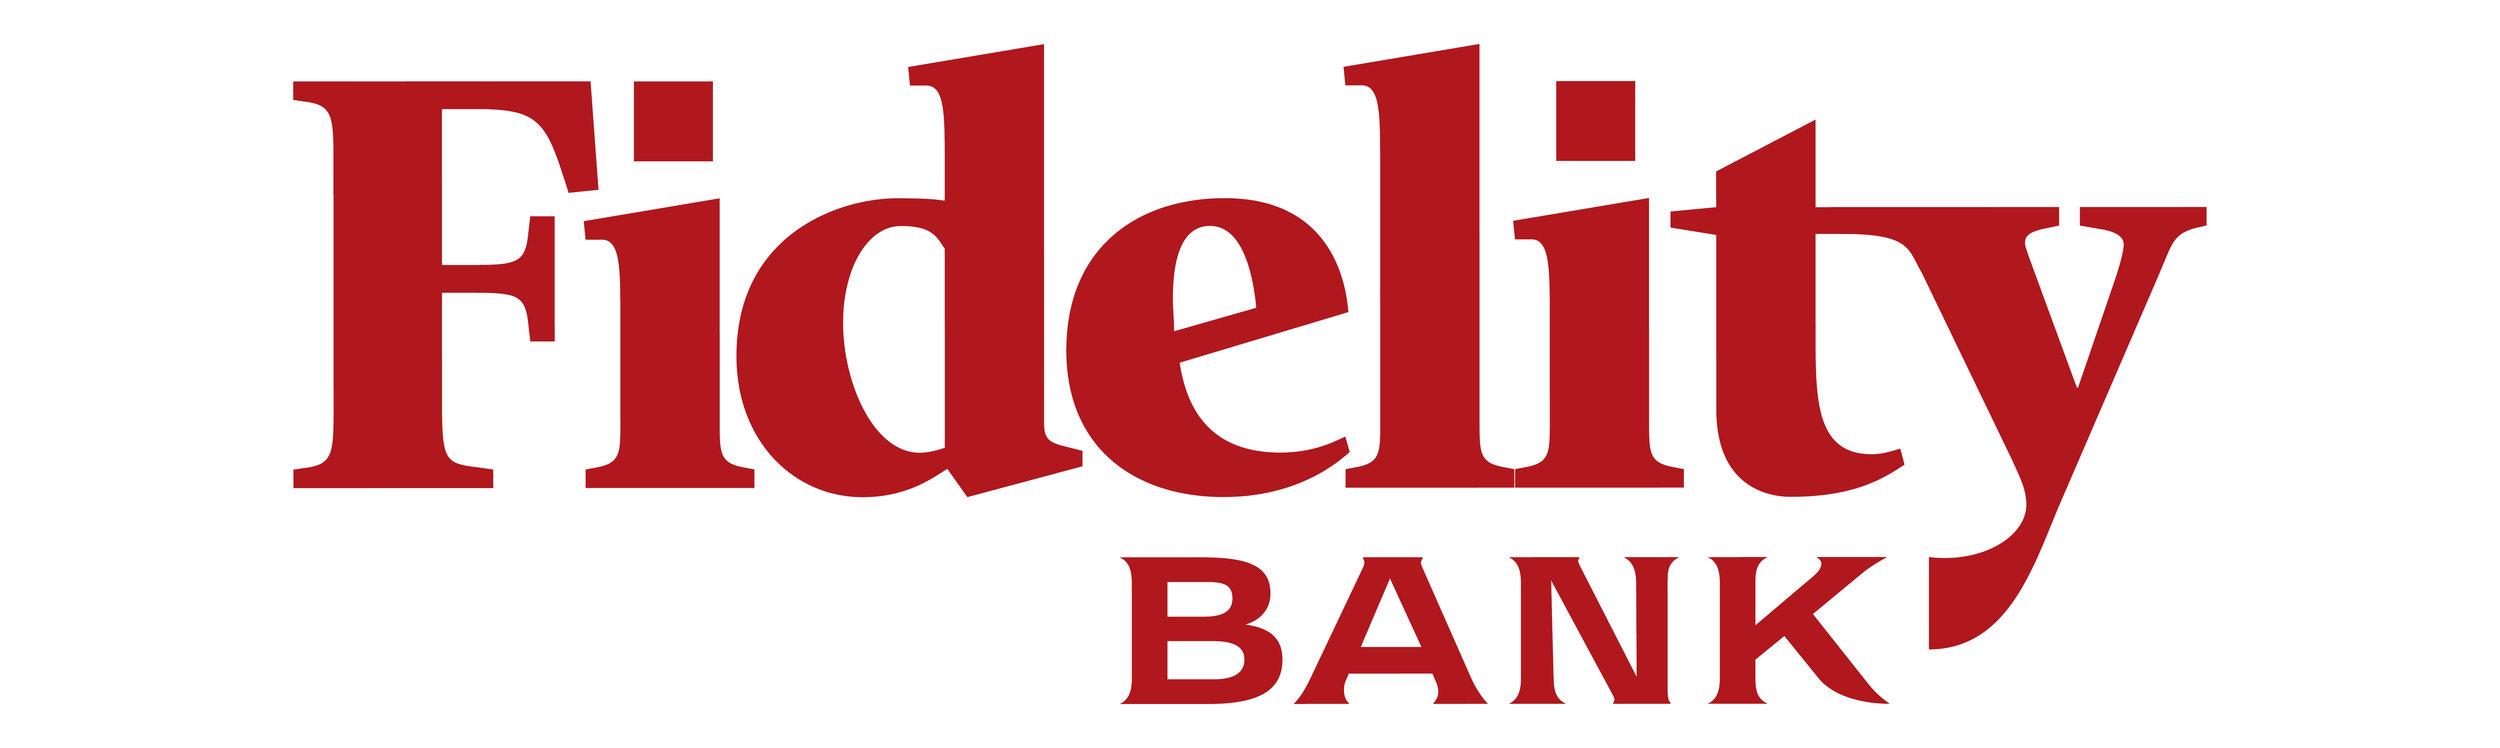 Fidelity Bank Logo - Web.jpg